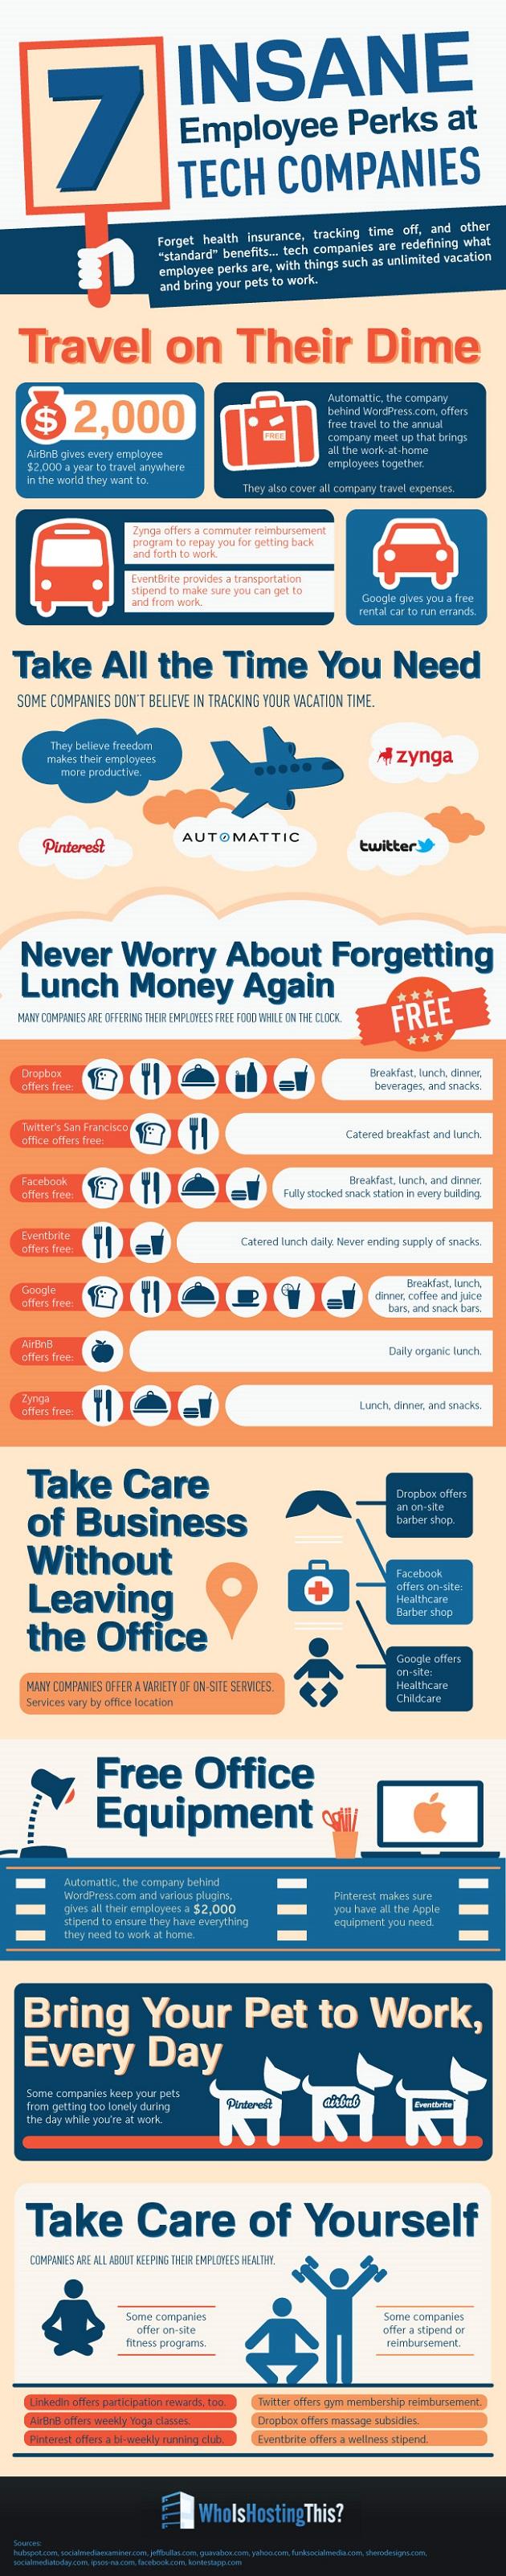 413820-infographic-7-insane-employee-perks-at-tech-companies.jpg